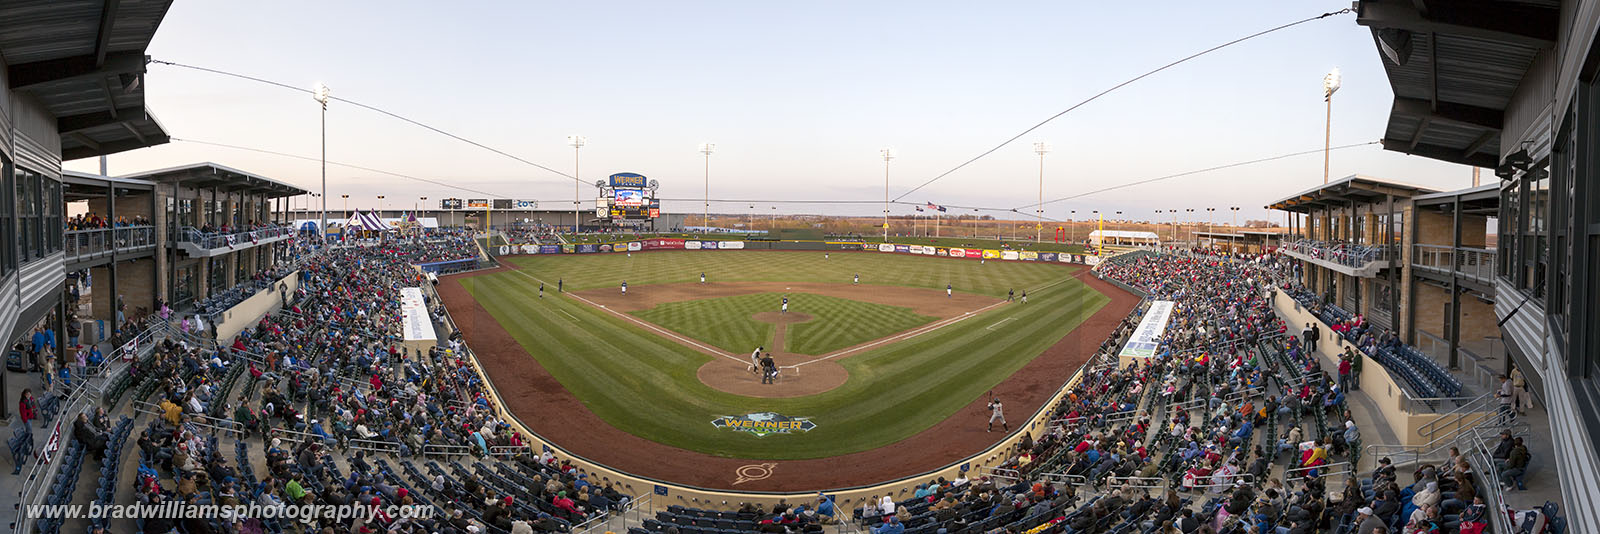 Omaha Storm Chasers, Werner Park, Papillion, Nebraska, Omaha, Baseball, photo